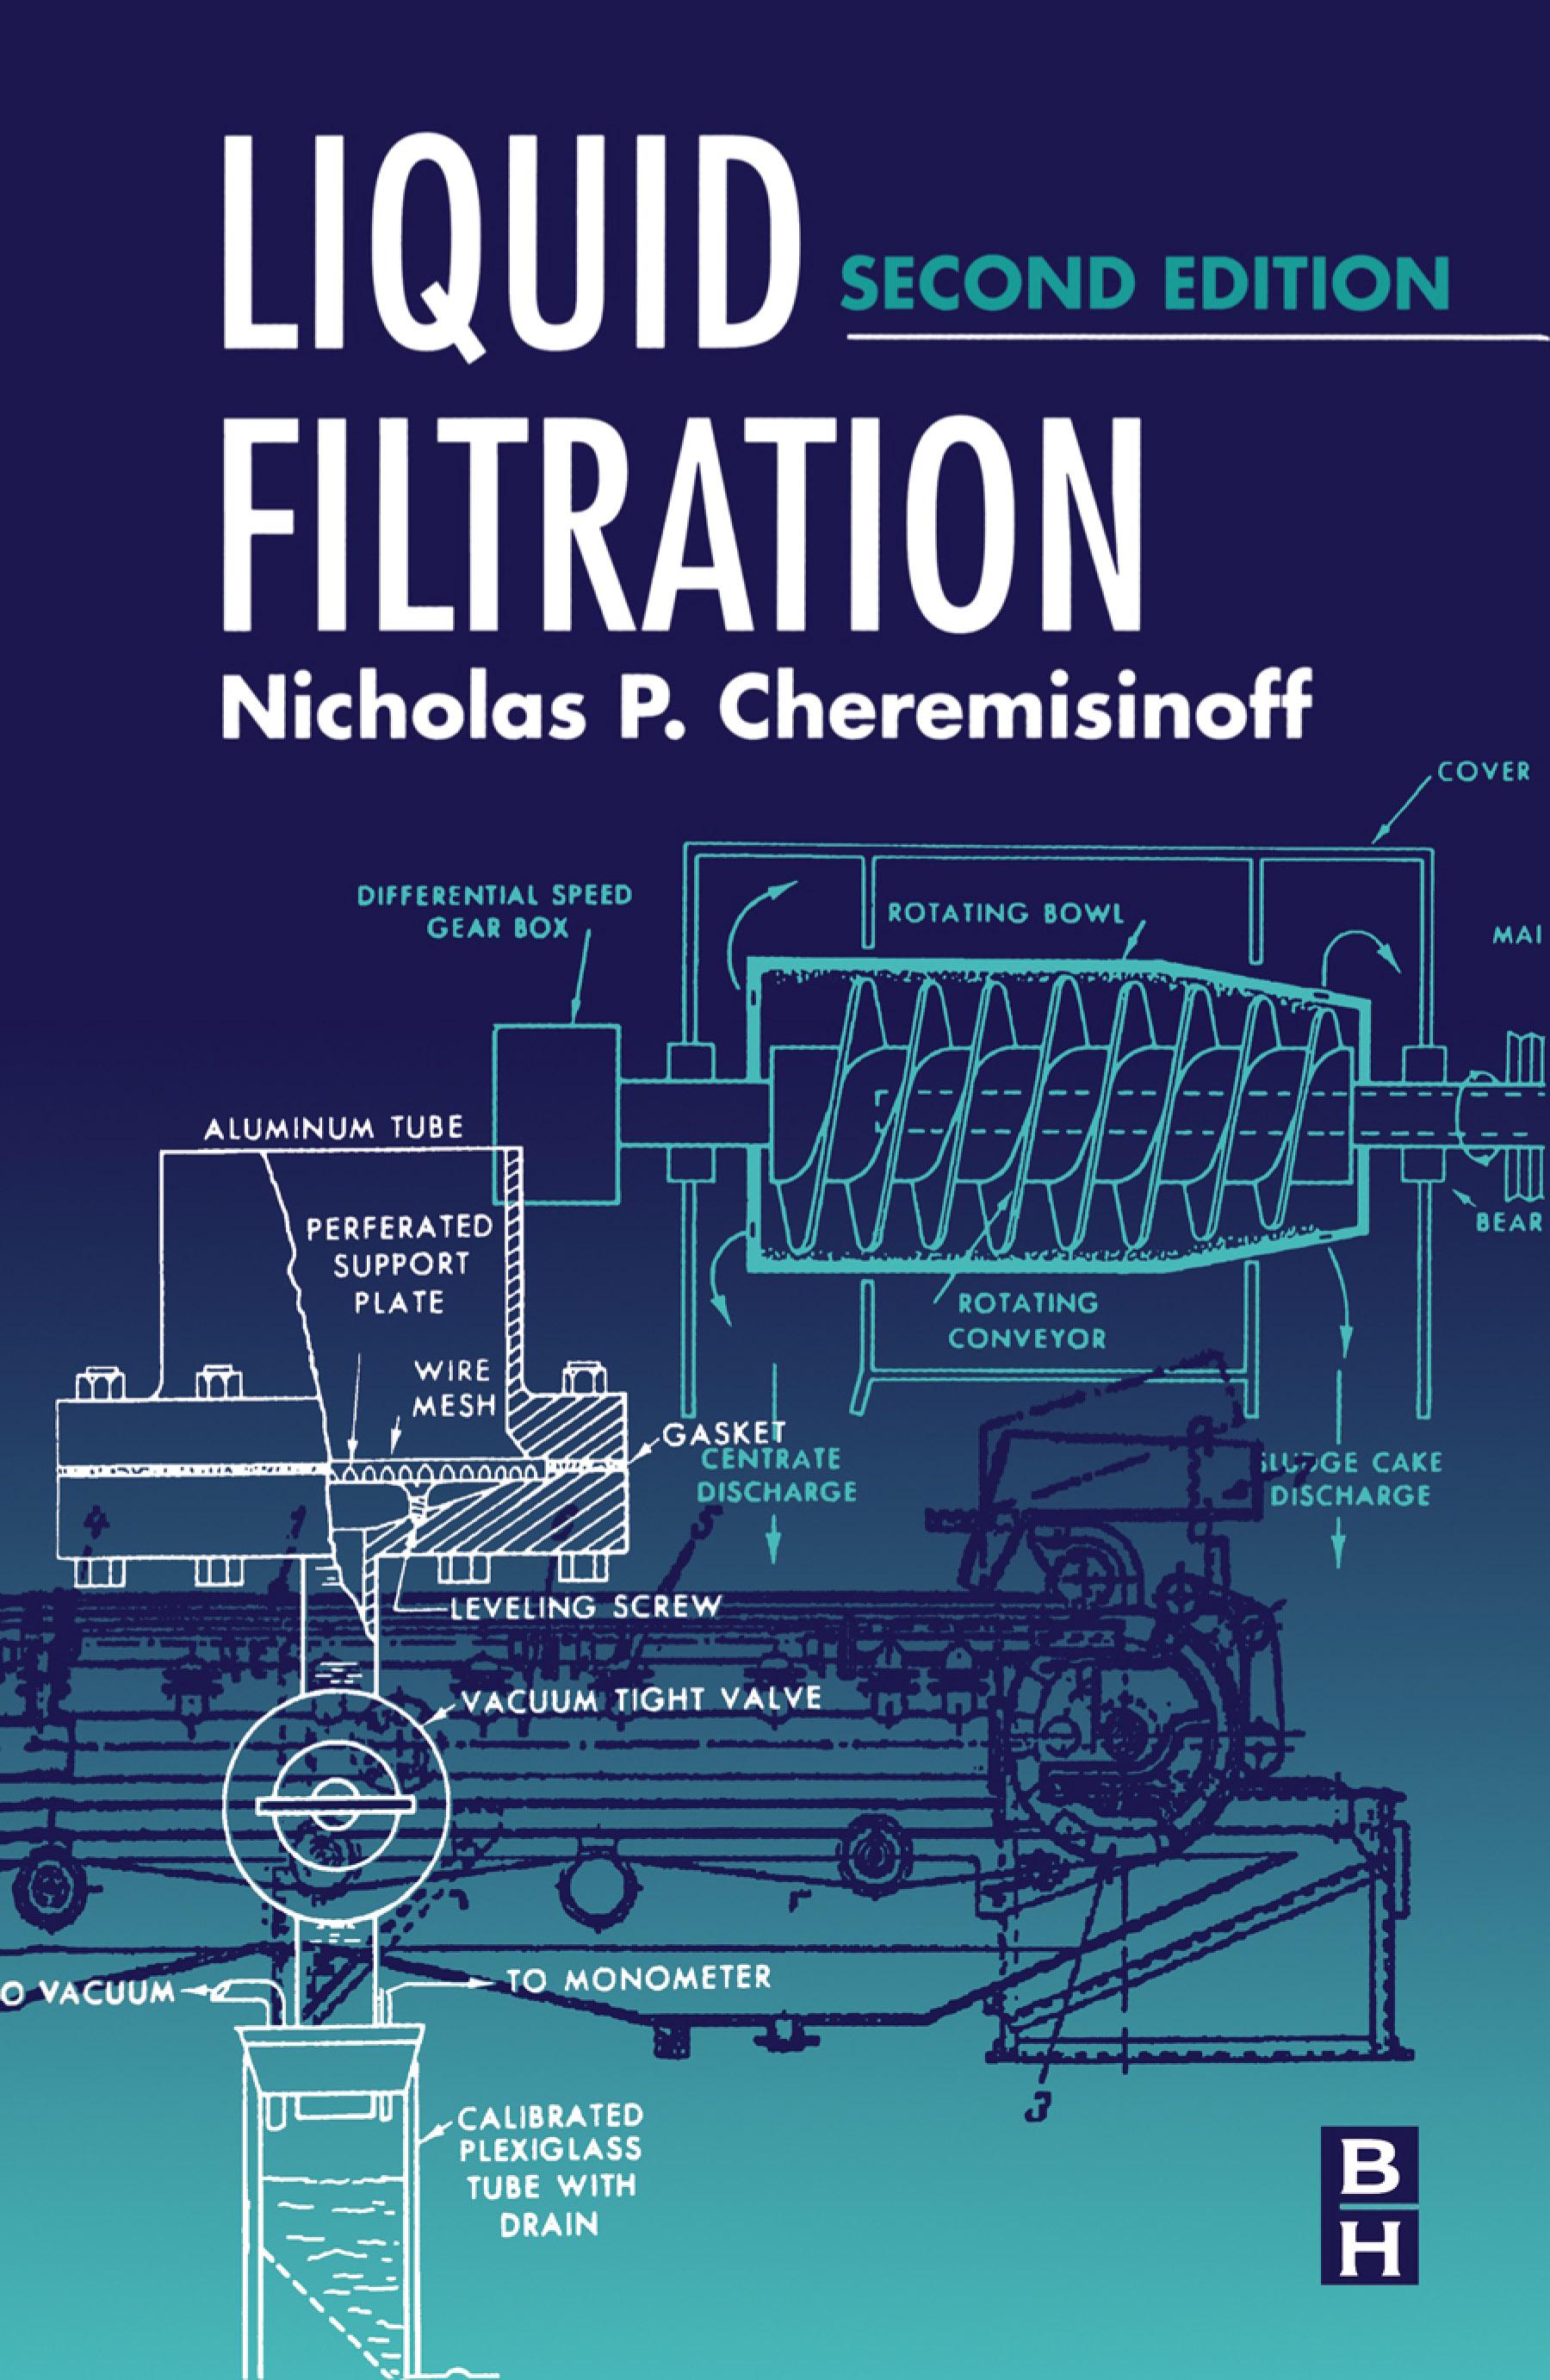 Download Ebook Liquid Filtration (2nd ed.) by Nicholas P Cheremisinoff Pdf